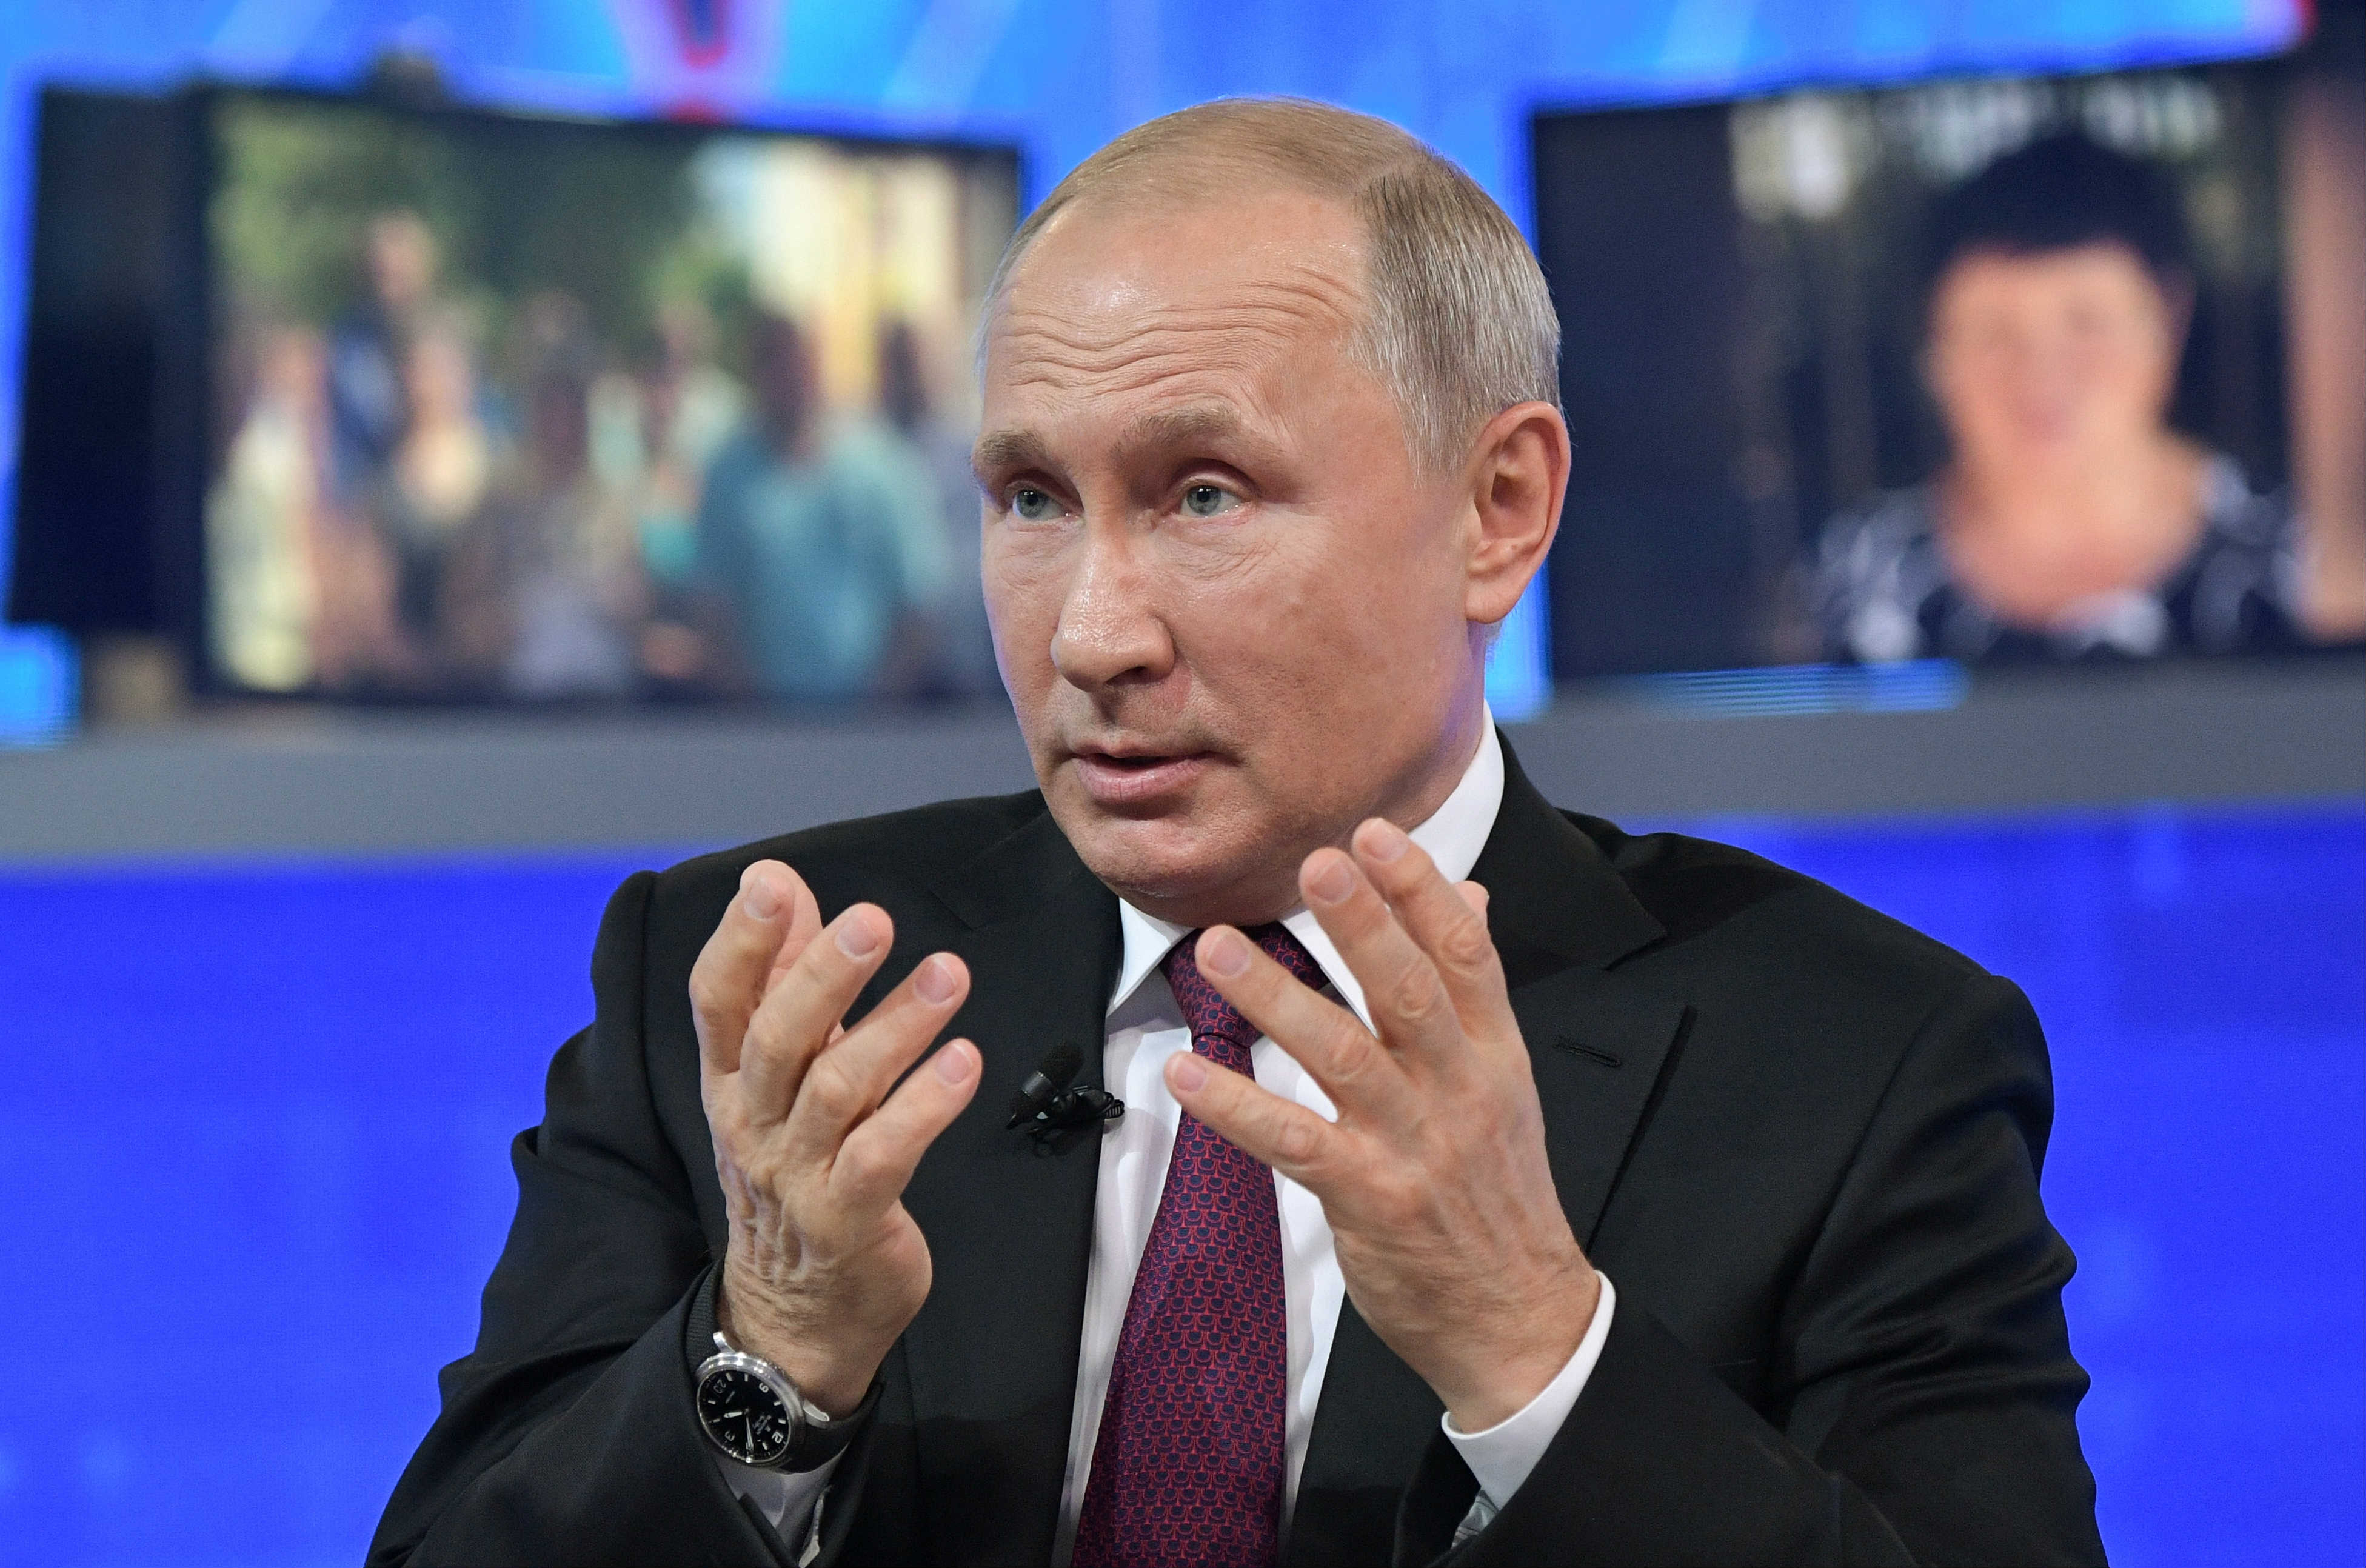 Putin finally tells Russians the truth (sort of)